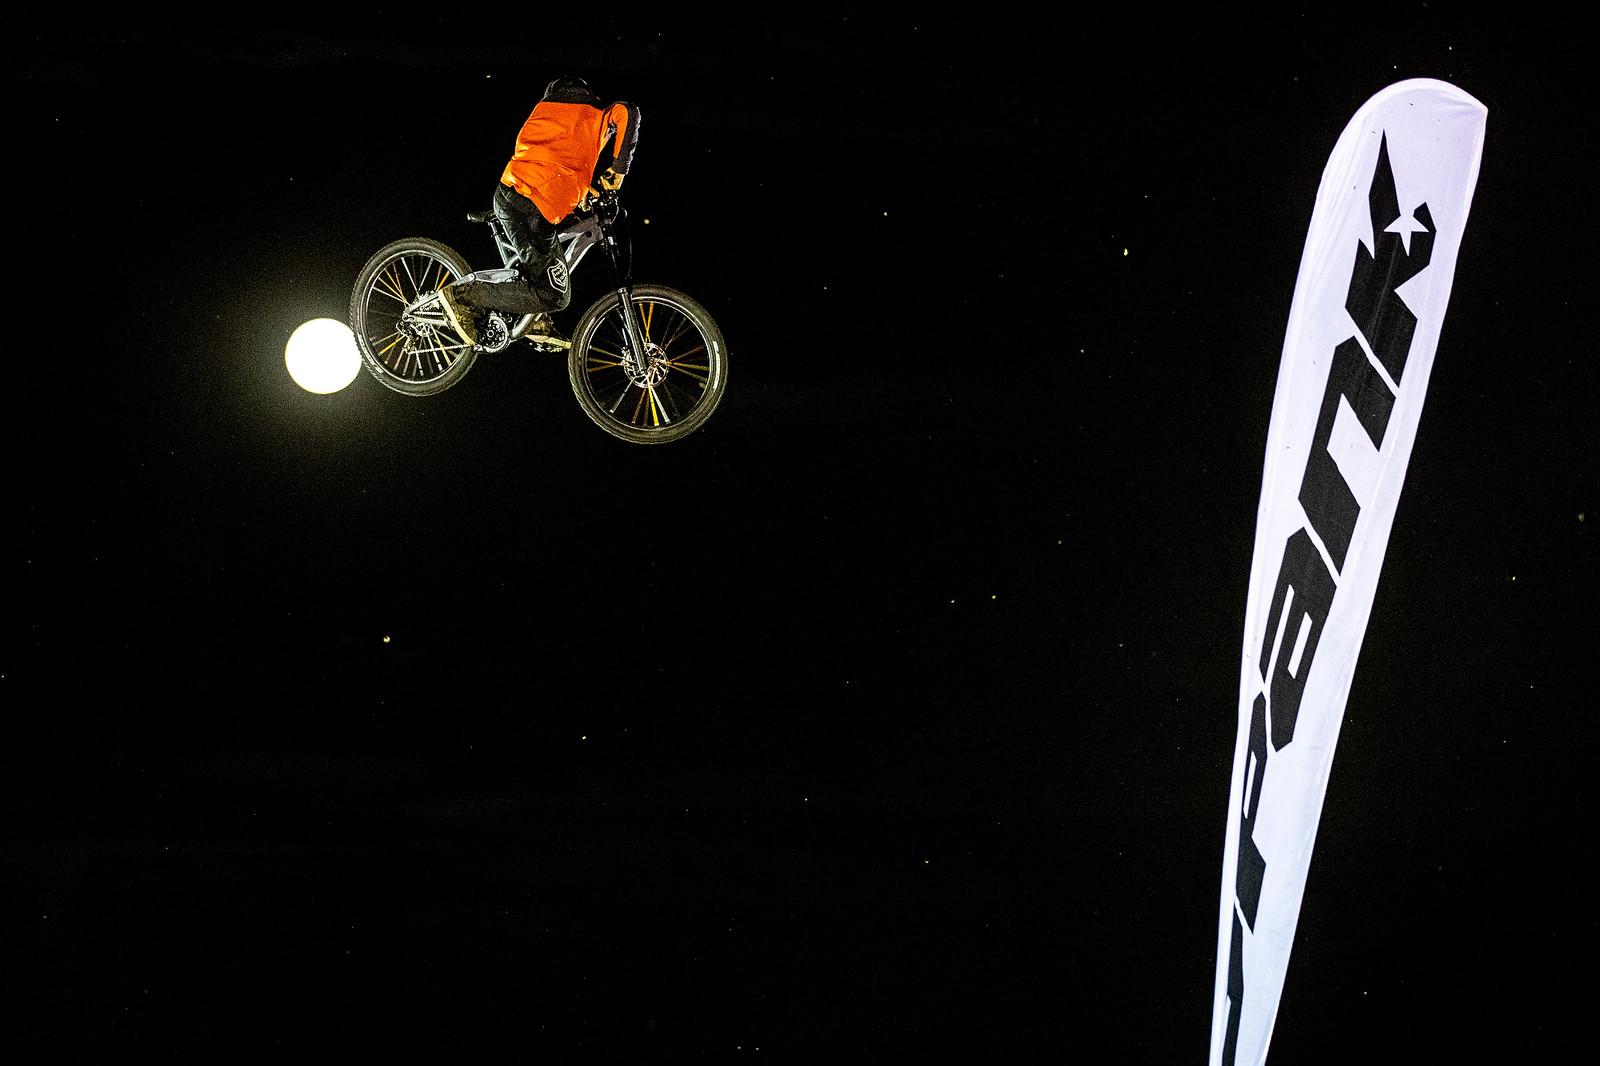 Peter Kaiser, Crankworx Rotorua Whip Off Winner - WHIP OFF GALLERY - Crankworx Rotorua - Mountain Biking Pictures - Vital MTB